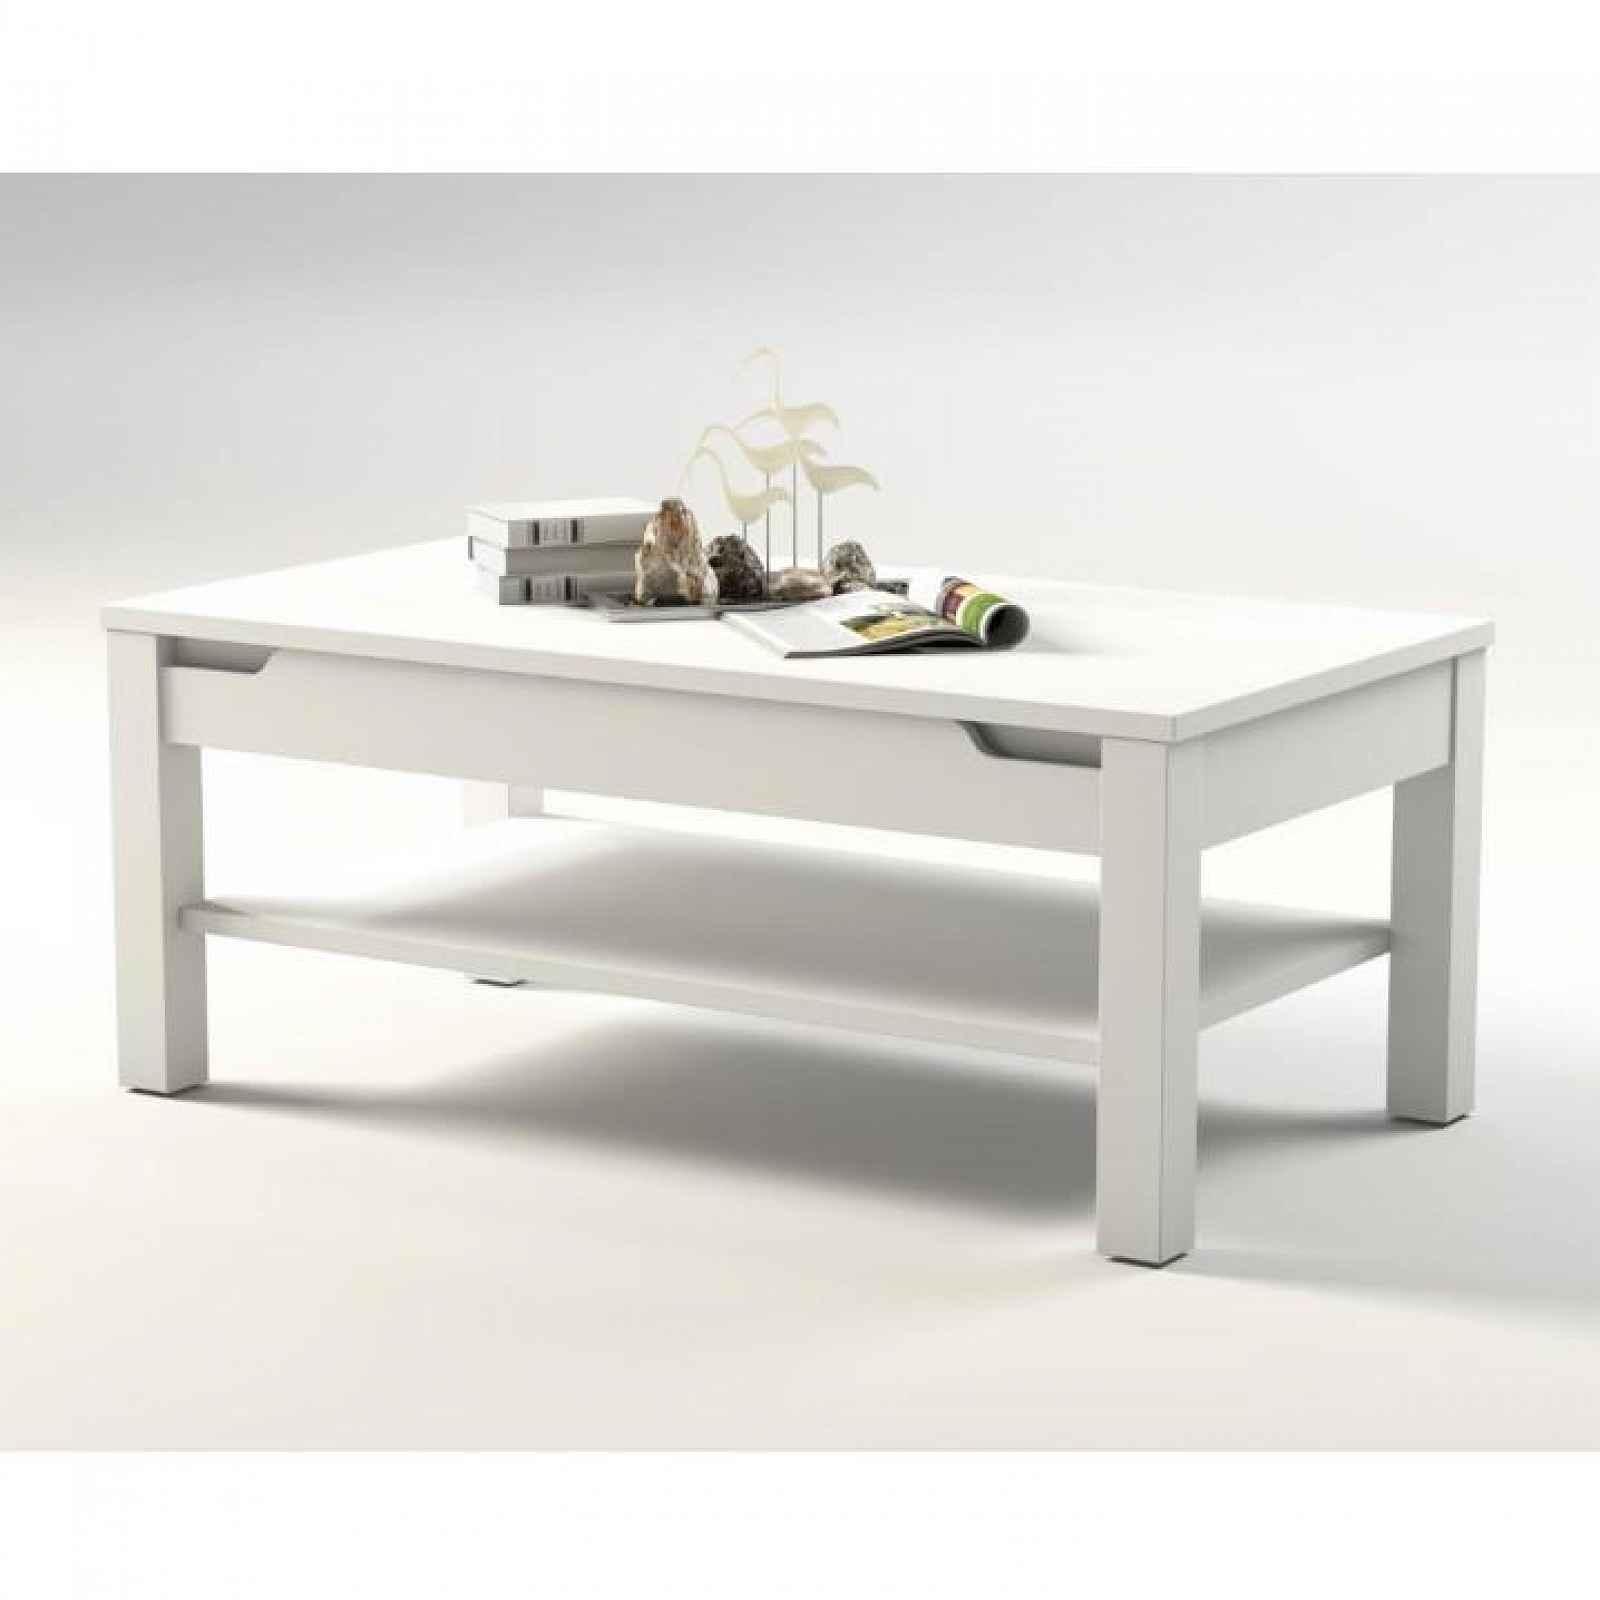 Konferenční stolek, bílá / bílá s extra vysokým leskem, ADONIS AS 96 0000186931 Tempo Kondela